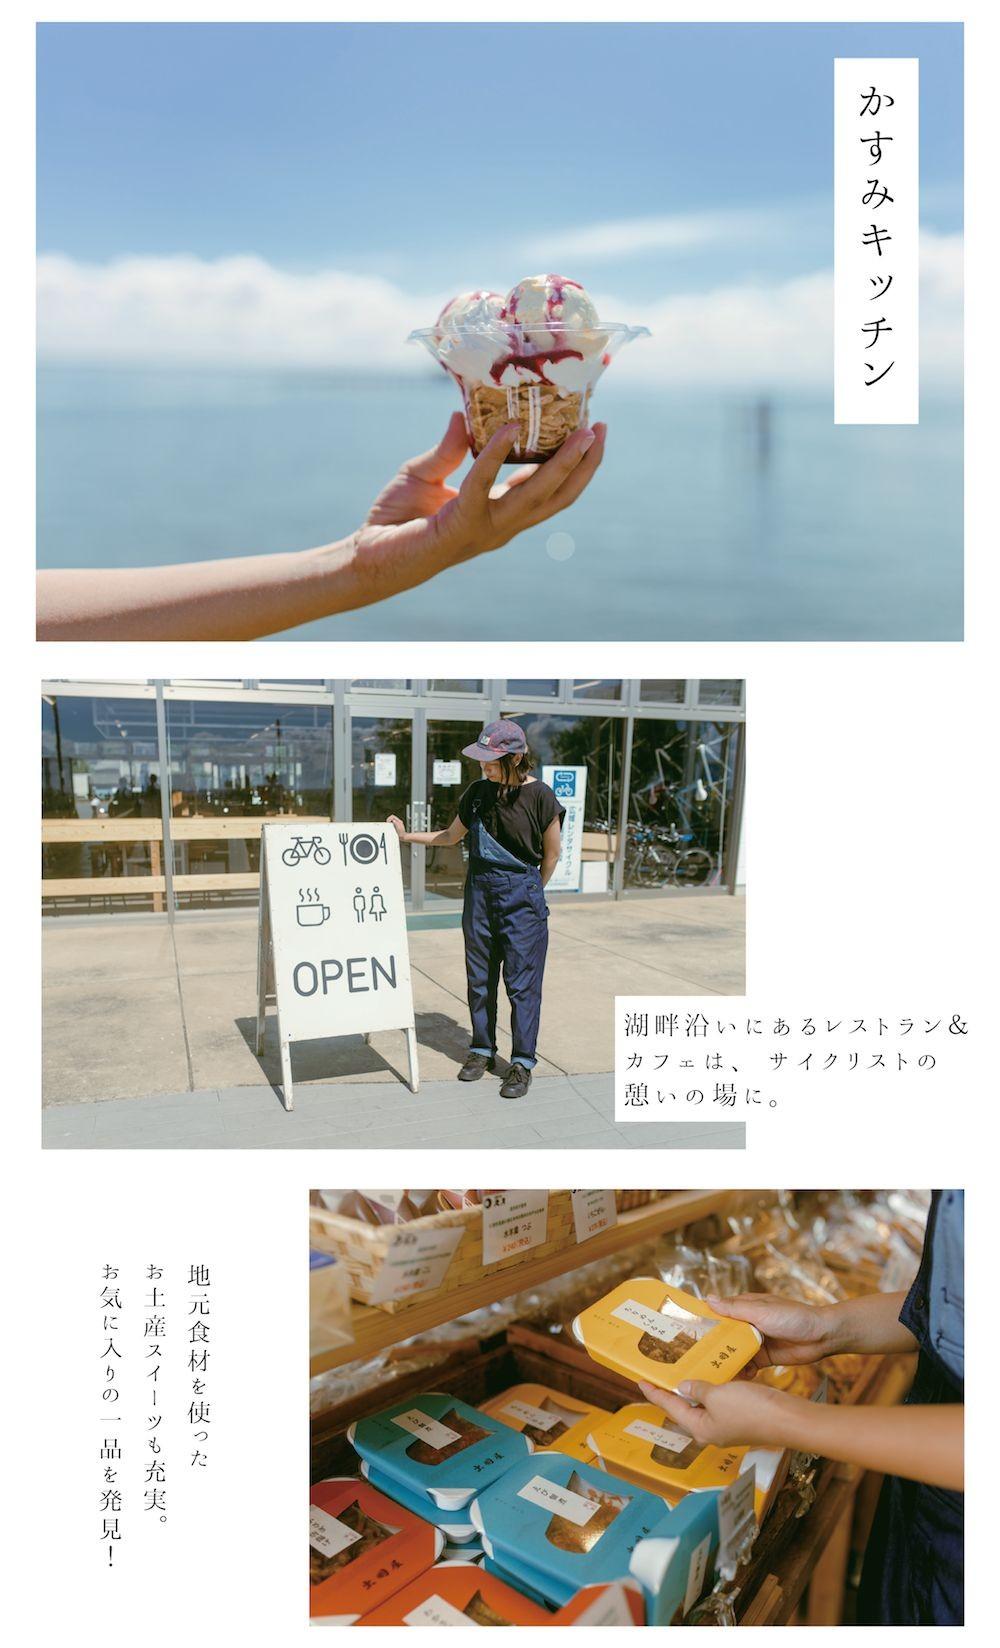 【SPOT】自転車旅で巡りたい、とびきりのごちそうや、よりみちスポット|「美しき、田舎景色を訪ねて。茨城自転車ものがたり。」の10枚目の画像